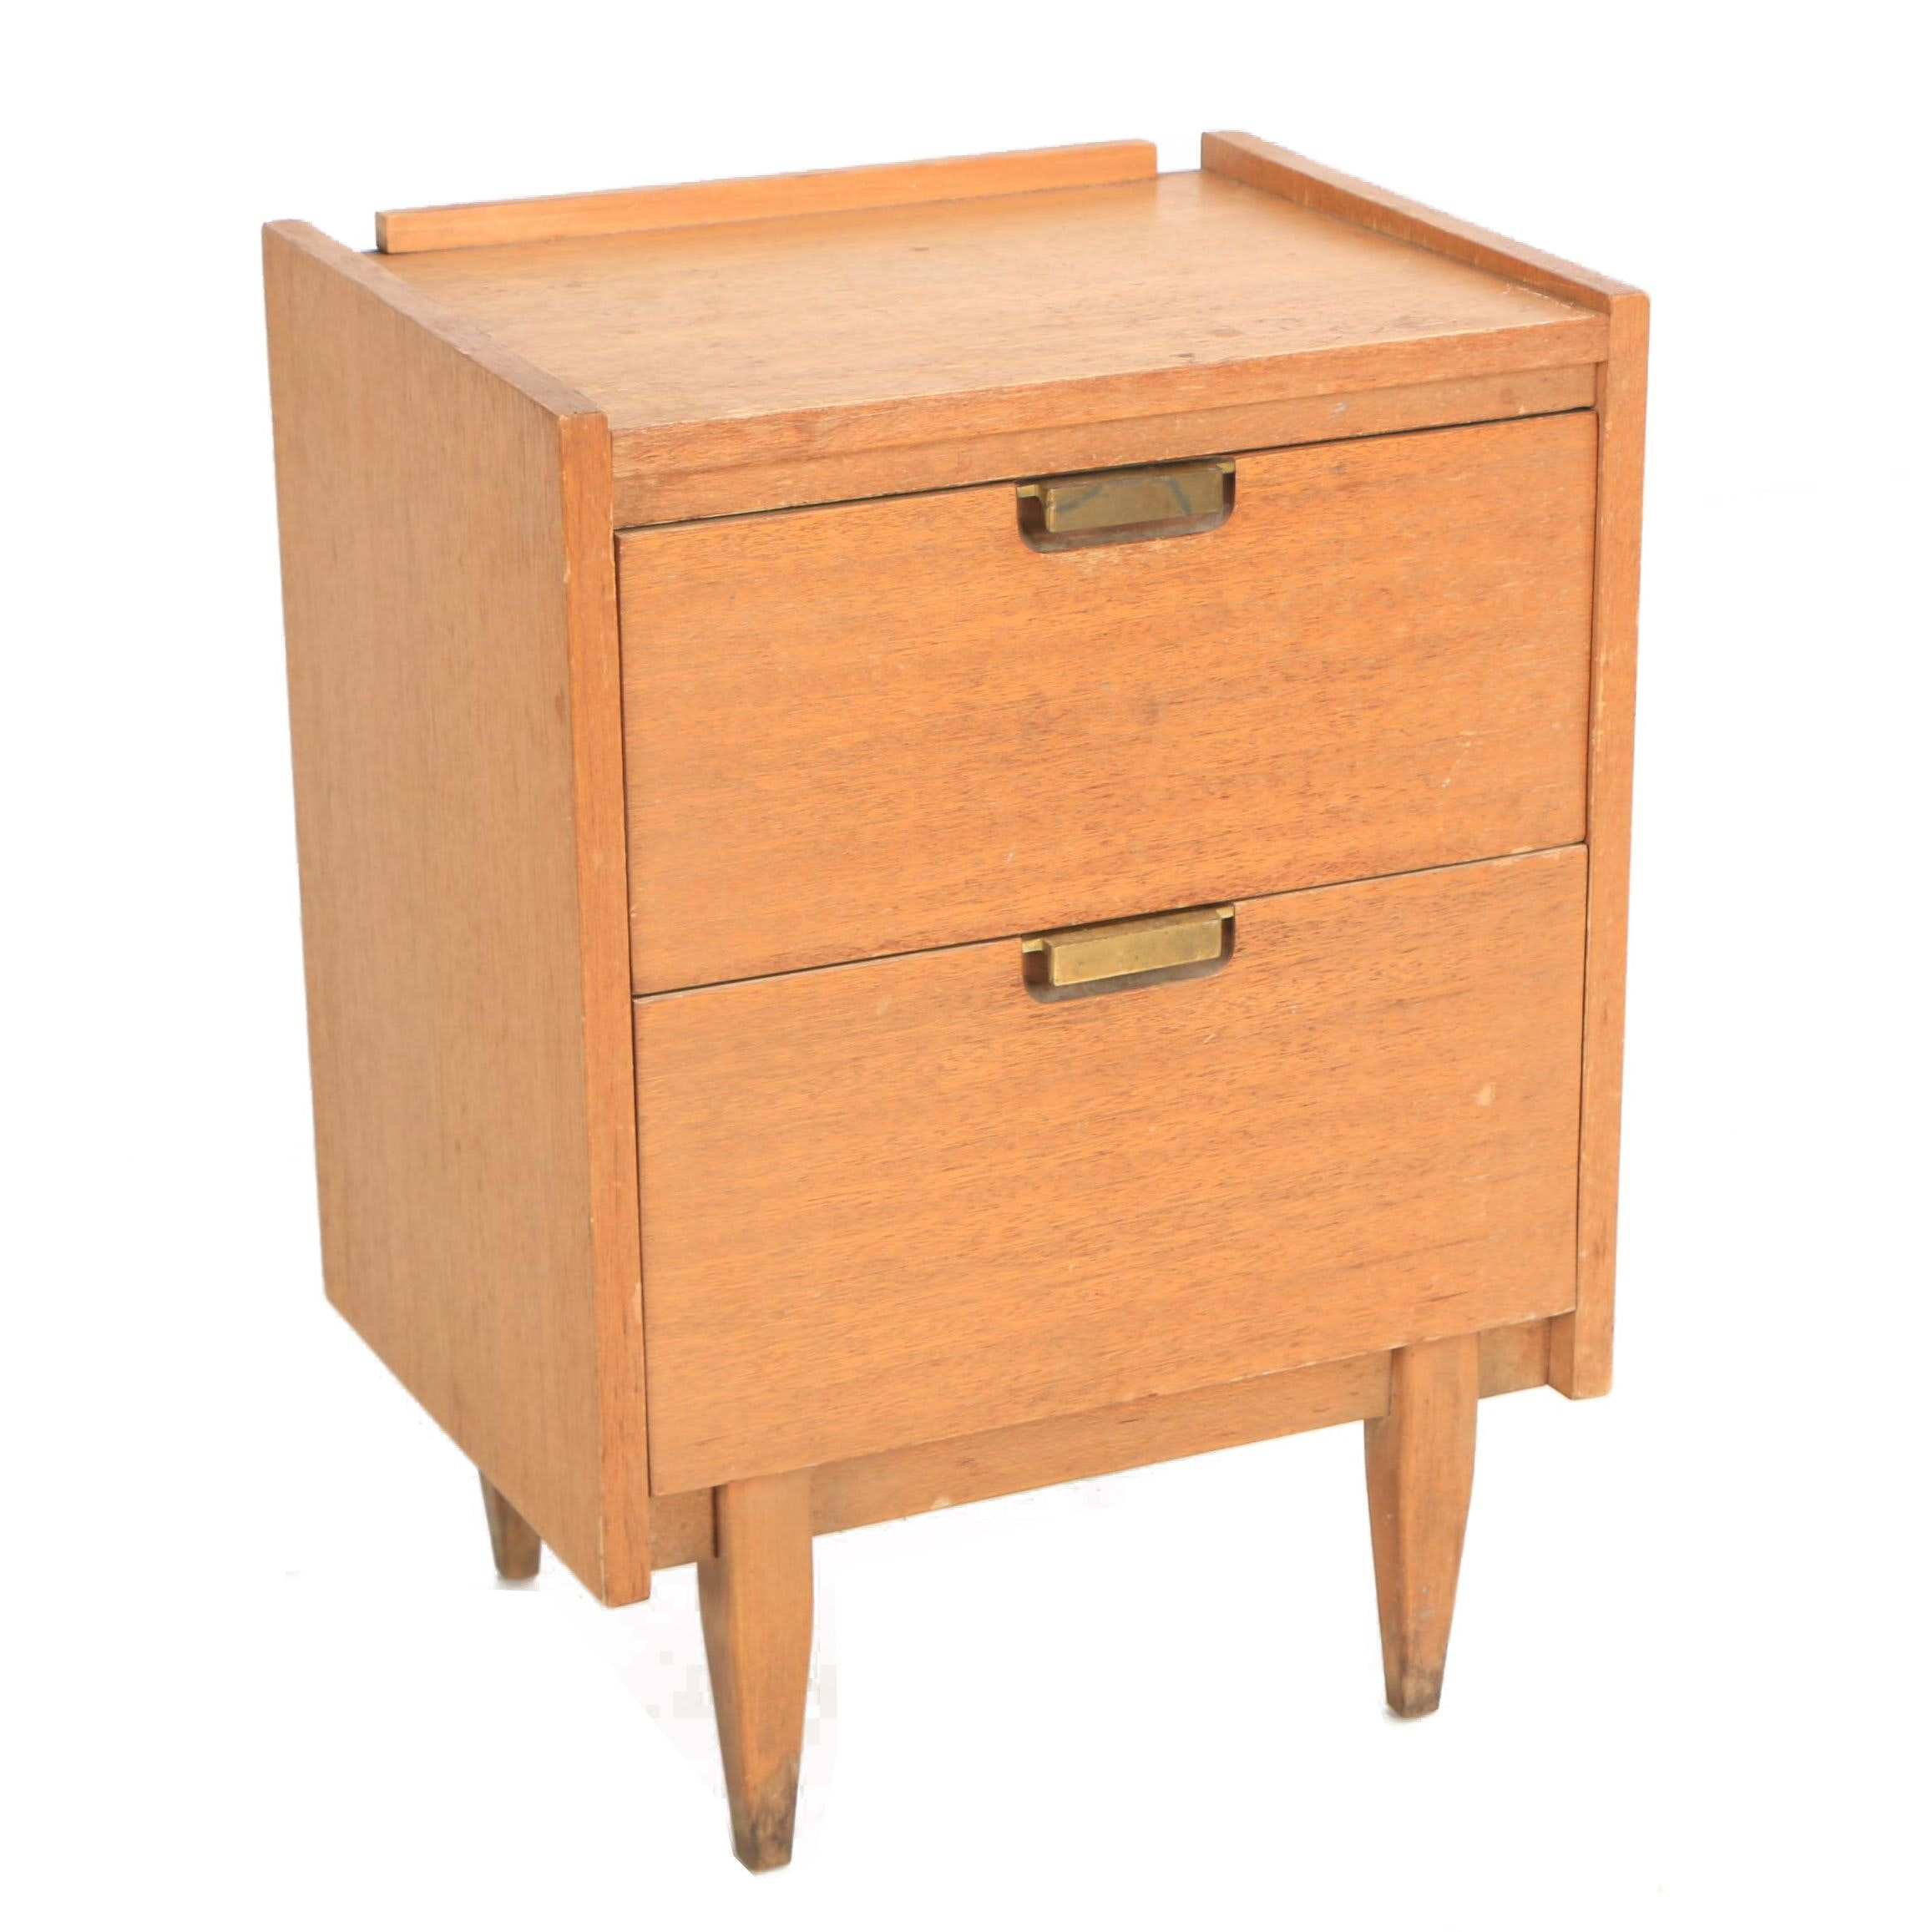 Mid Century Modern Wooden Nightstand